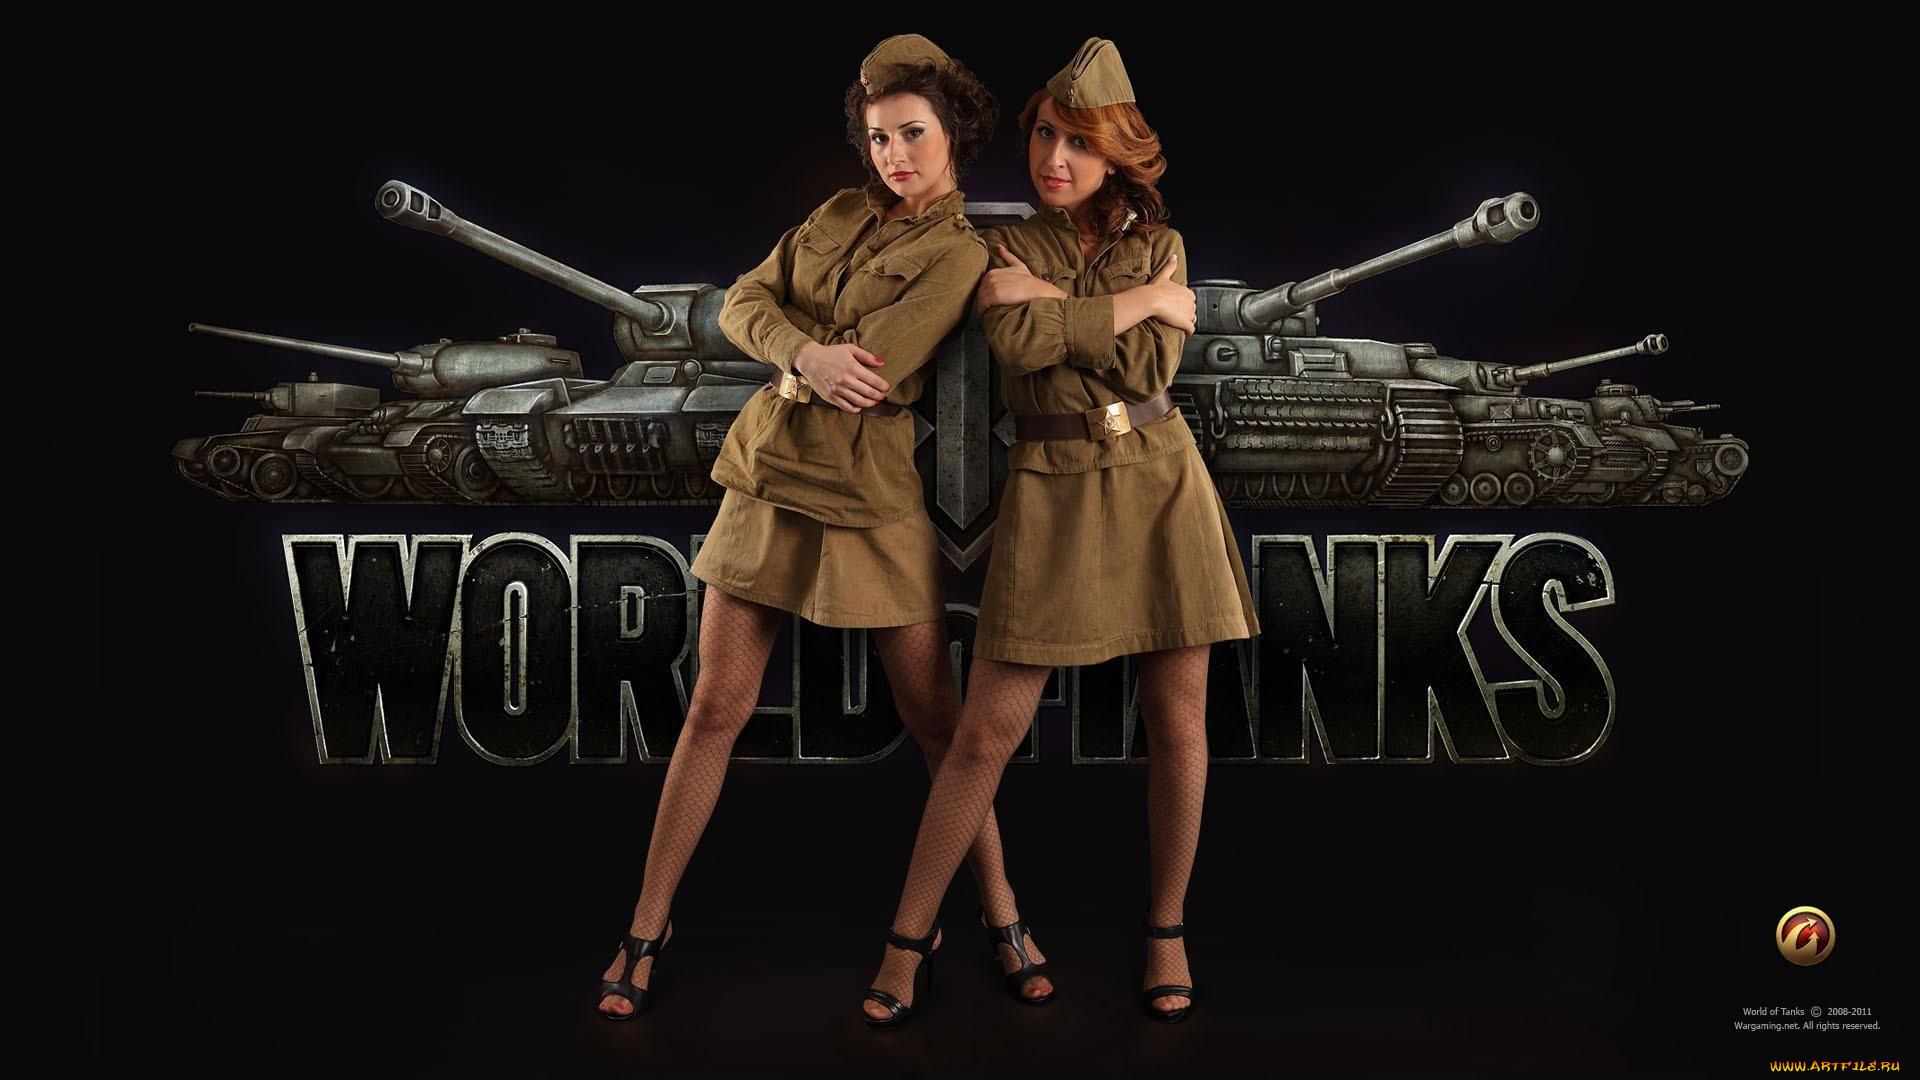 Обои и календари | World of Tanks